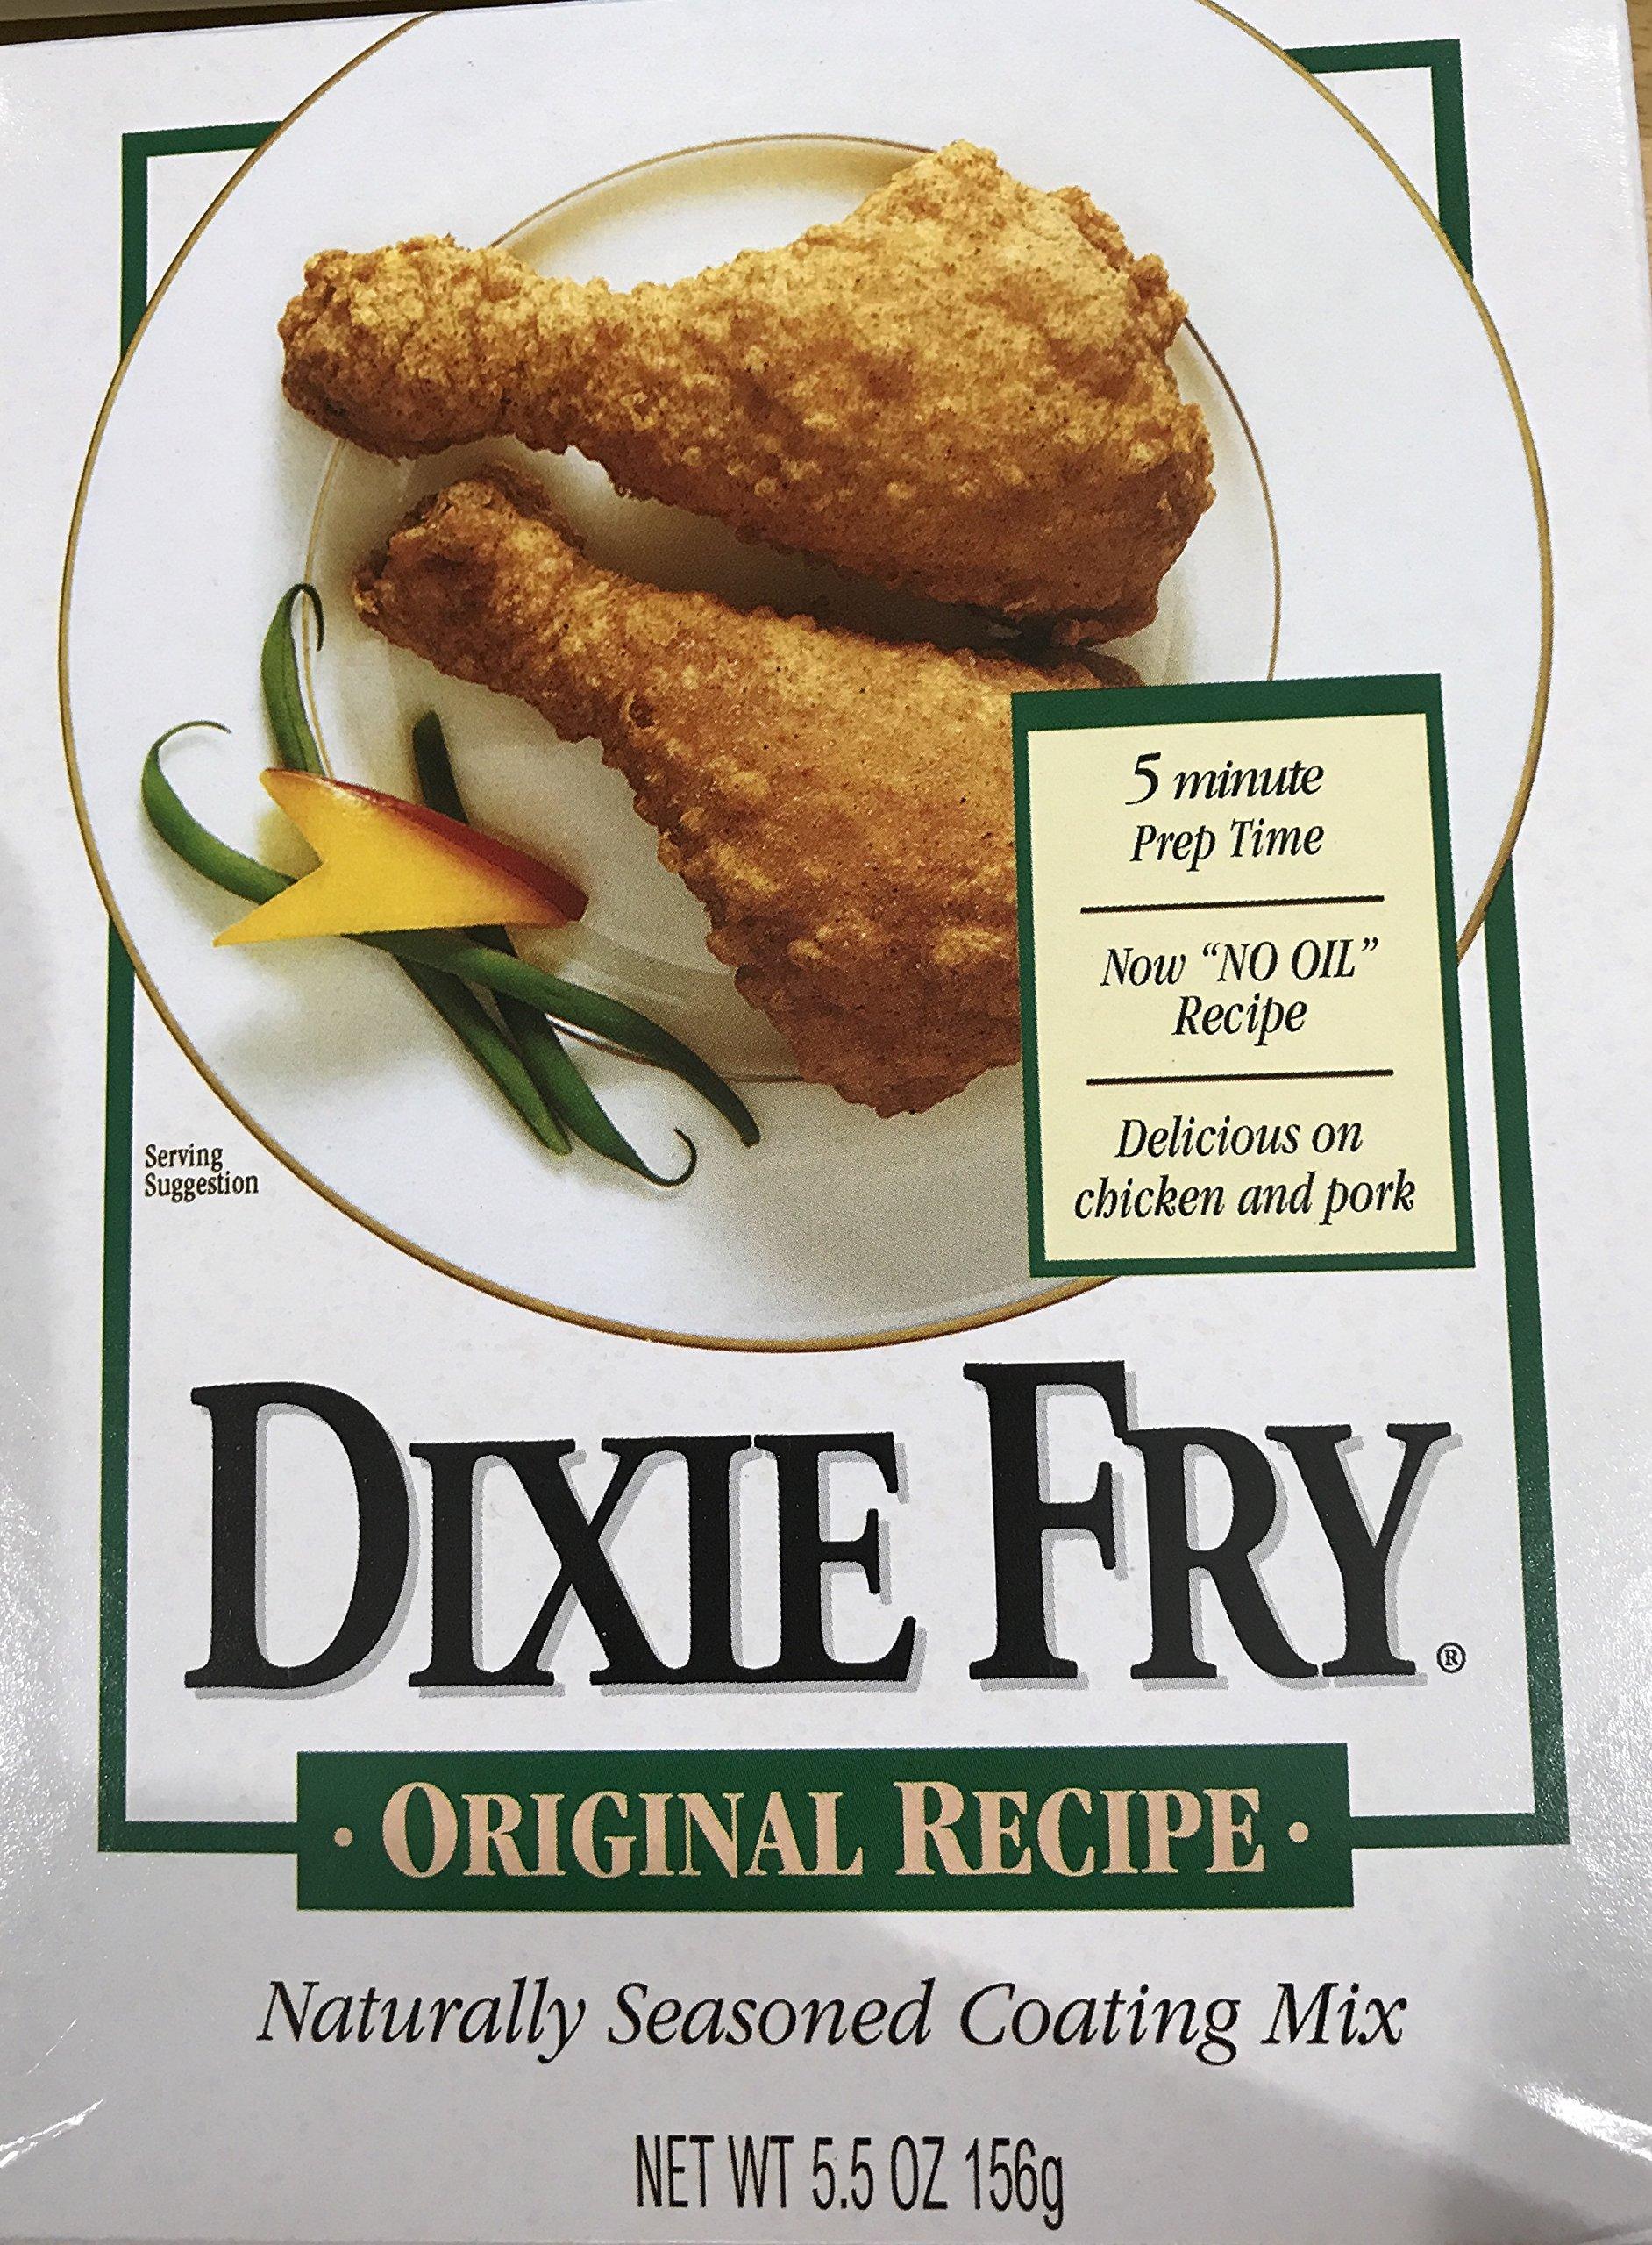 Dixie Fry Original Recipe Naturally Seasoned Coating Mix - Pack of 2 - 5.5 Ounces each